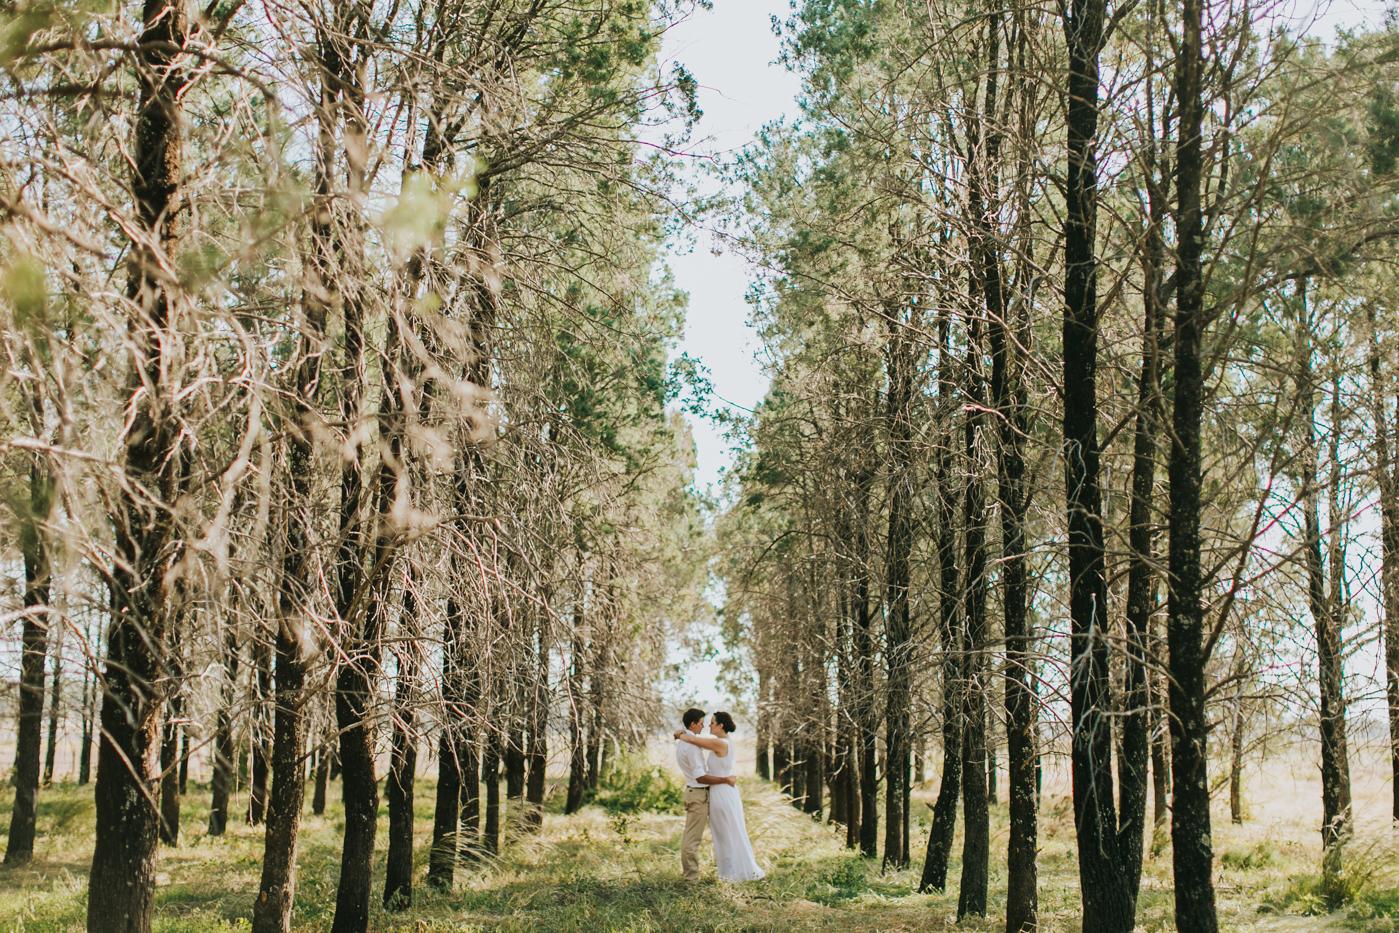 Nicolle & Jacob - Dubbo Wedding - Country Australia - Samantha Heather Photography-179.jpg